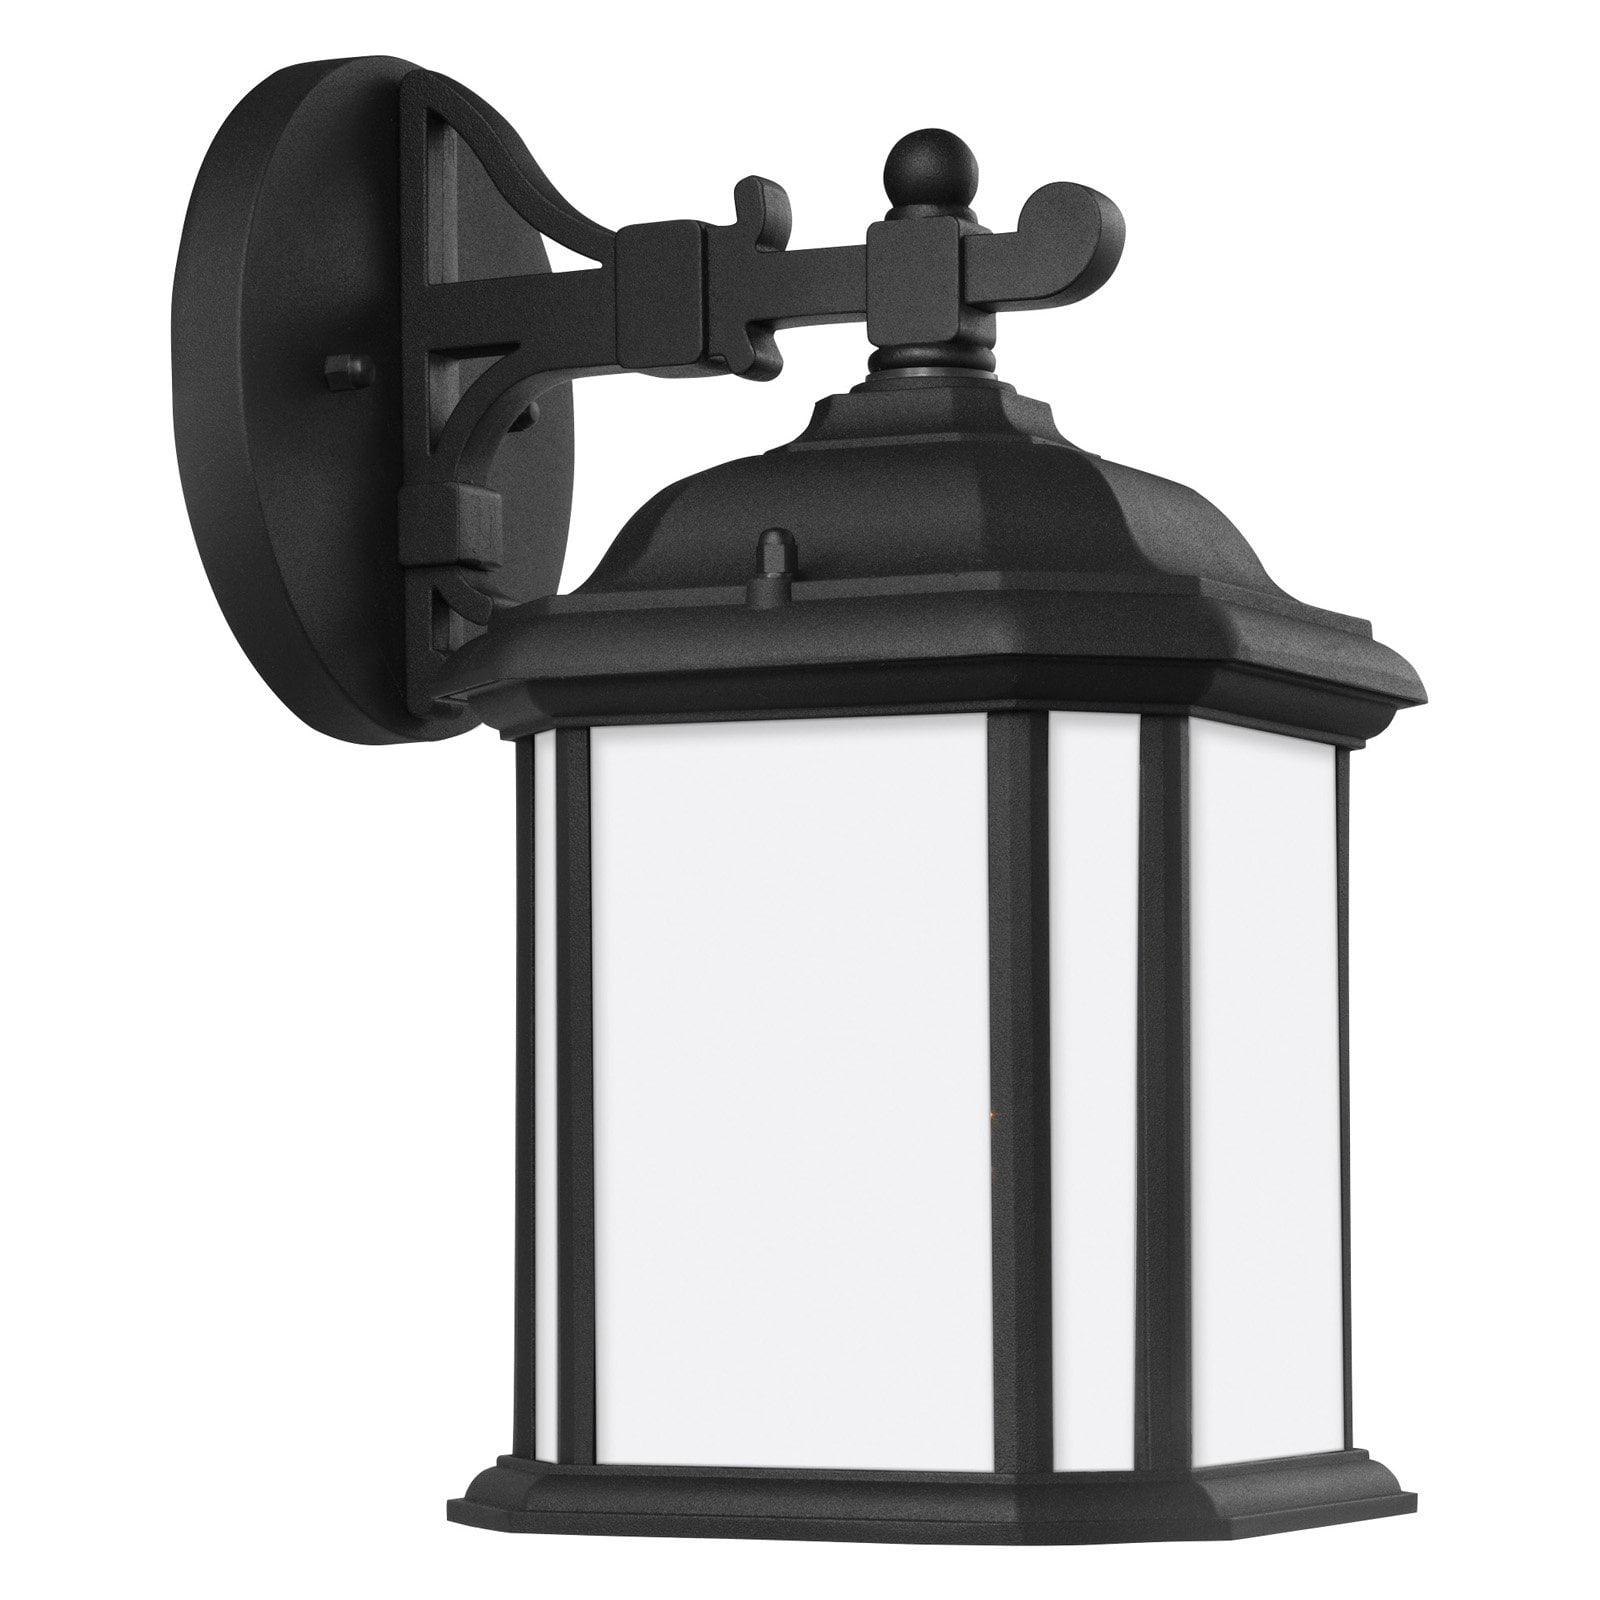 Sea Gull Lighting Kent 84529 Outdoor Wall Lantern